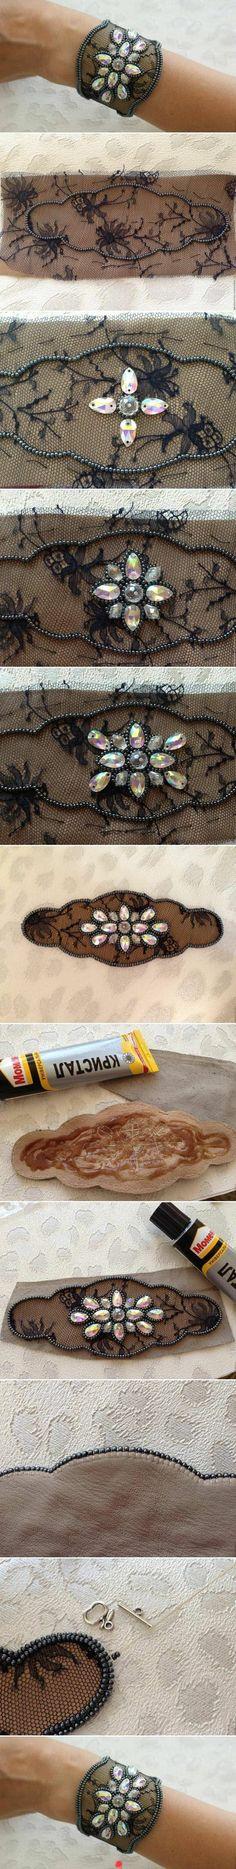 Fabric Bracelet DIY tutorials, beaded lace line will use Jane combine quite elegant bracelet styles.